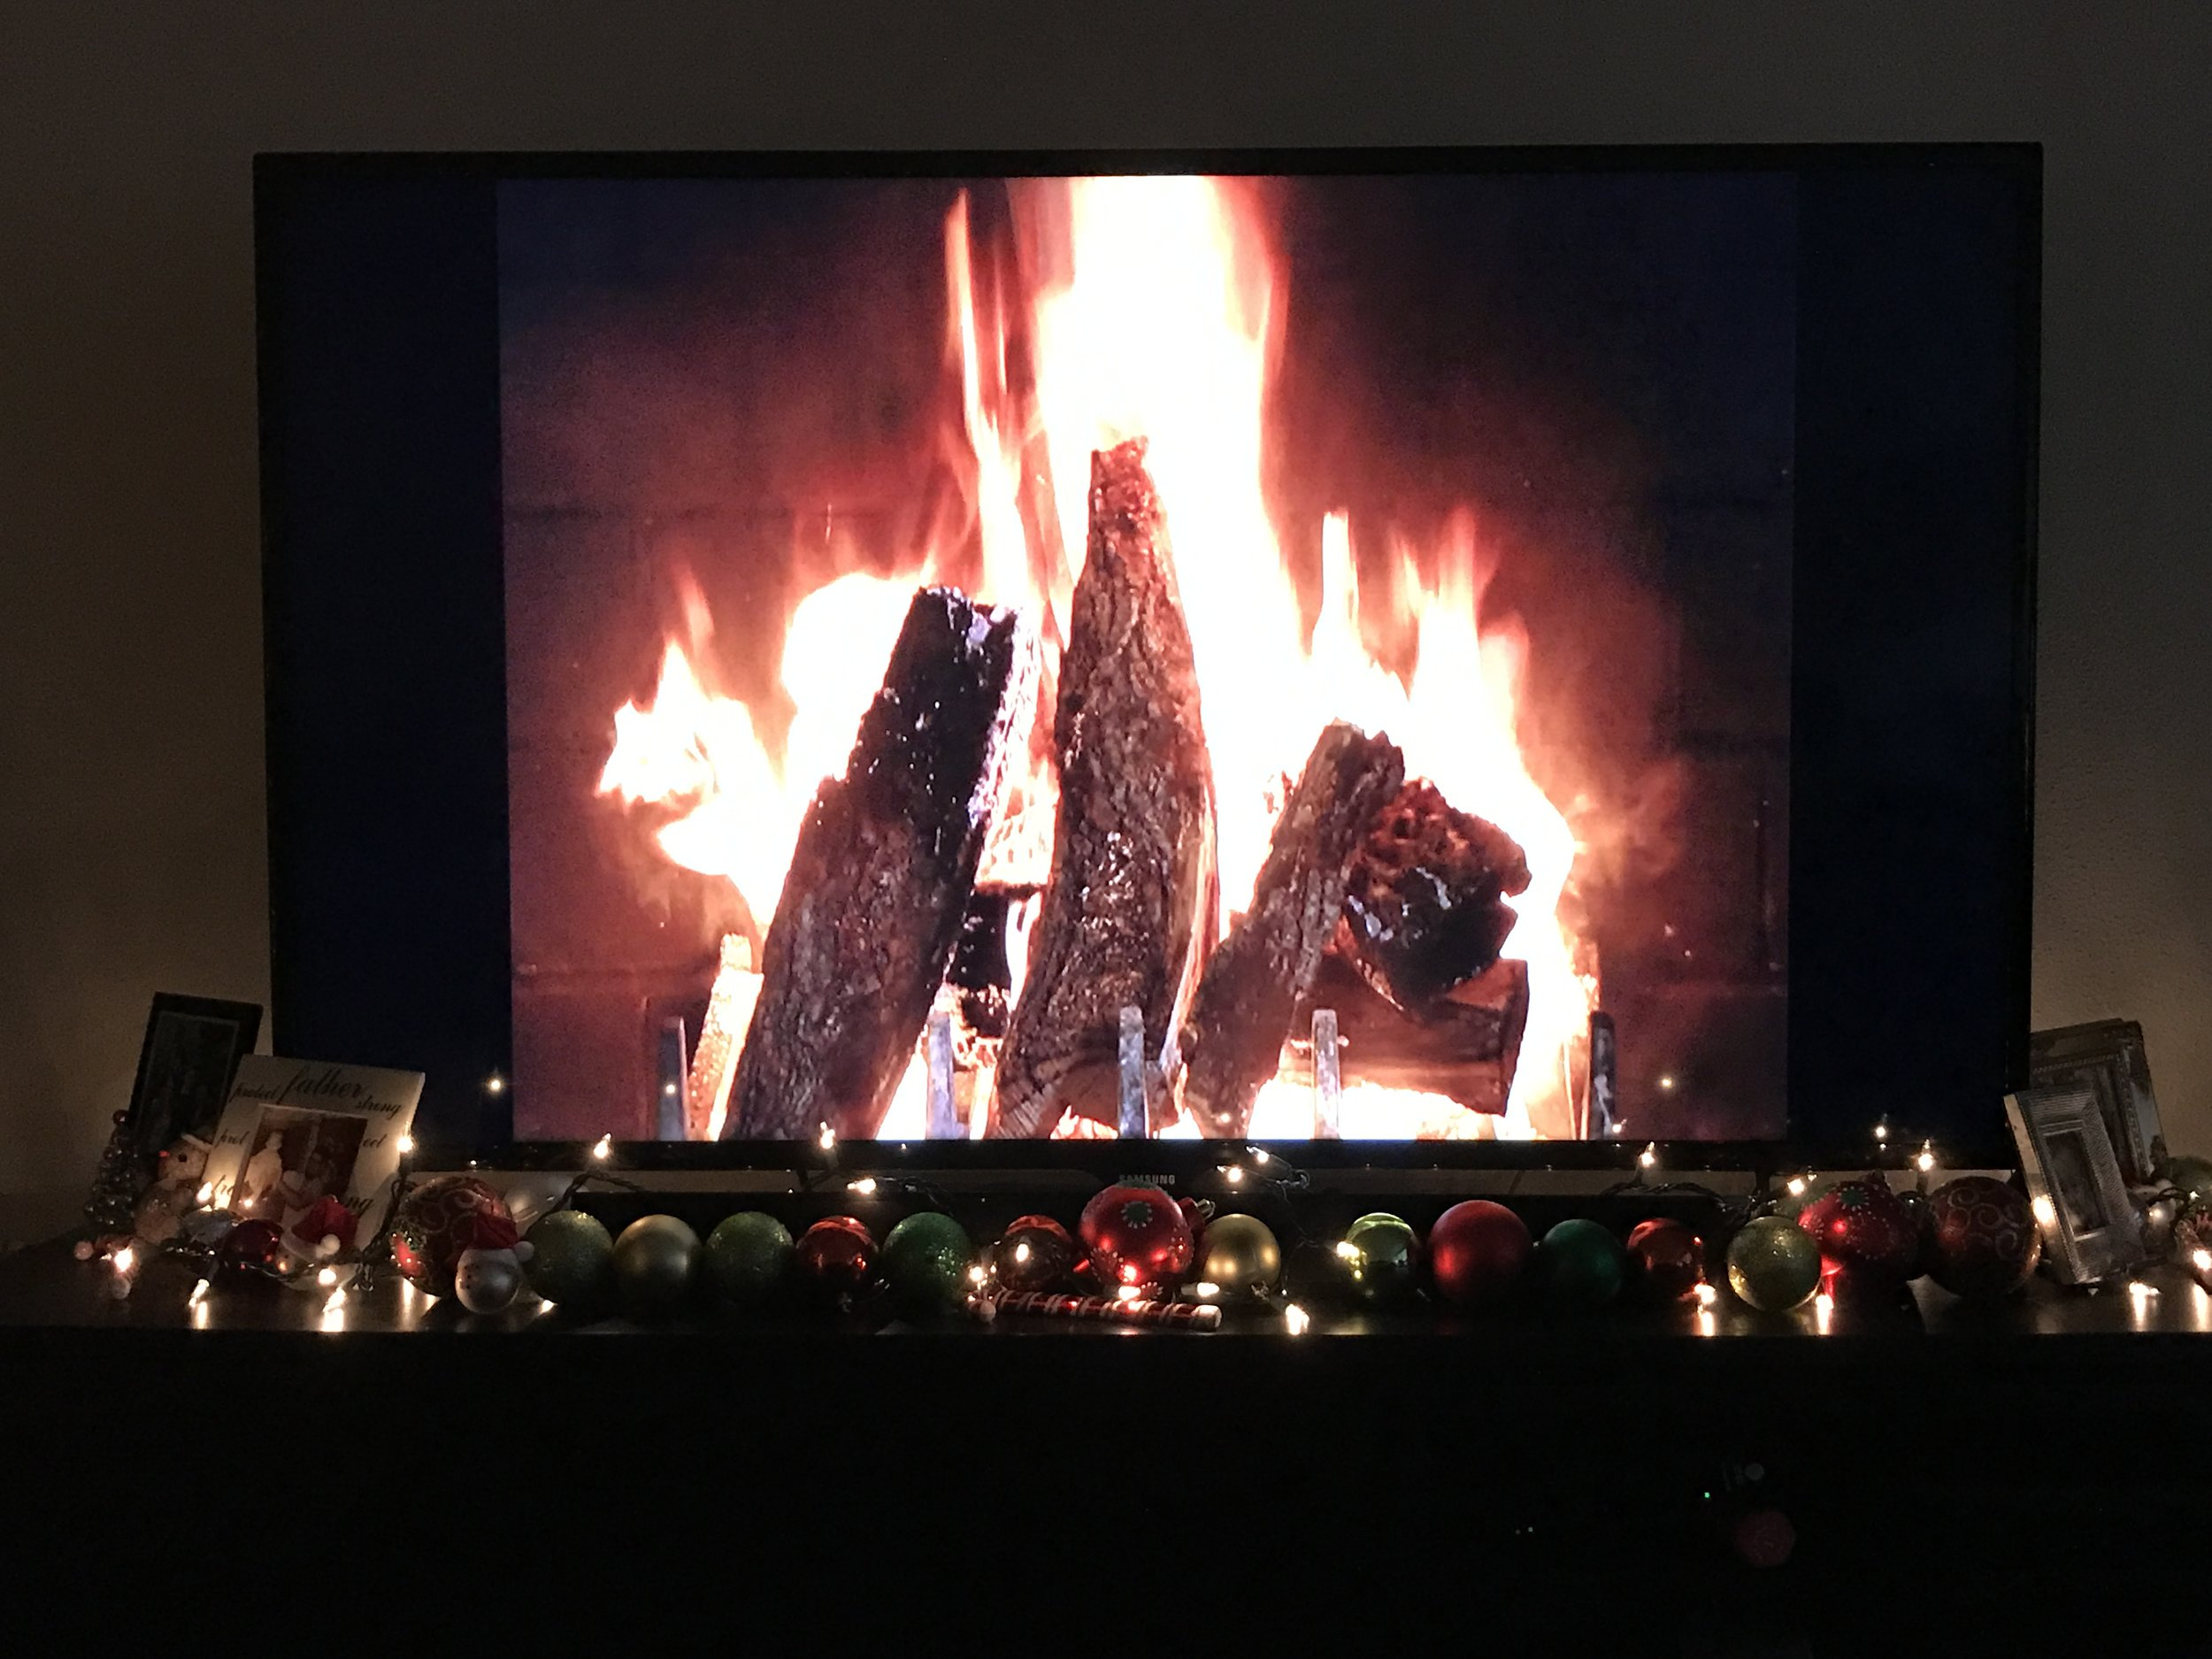 christmas decor 4.jpg